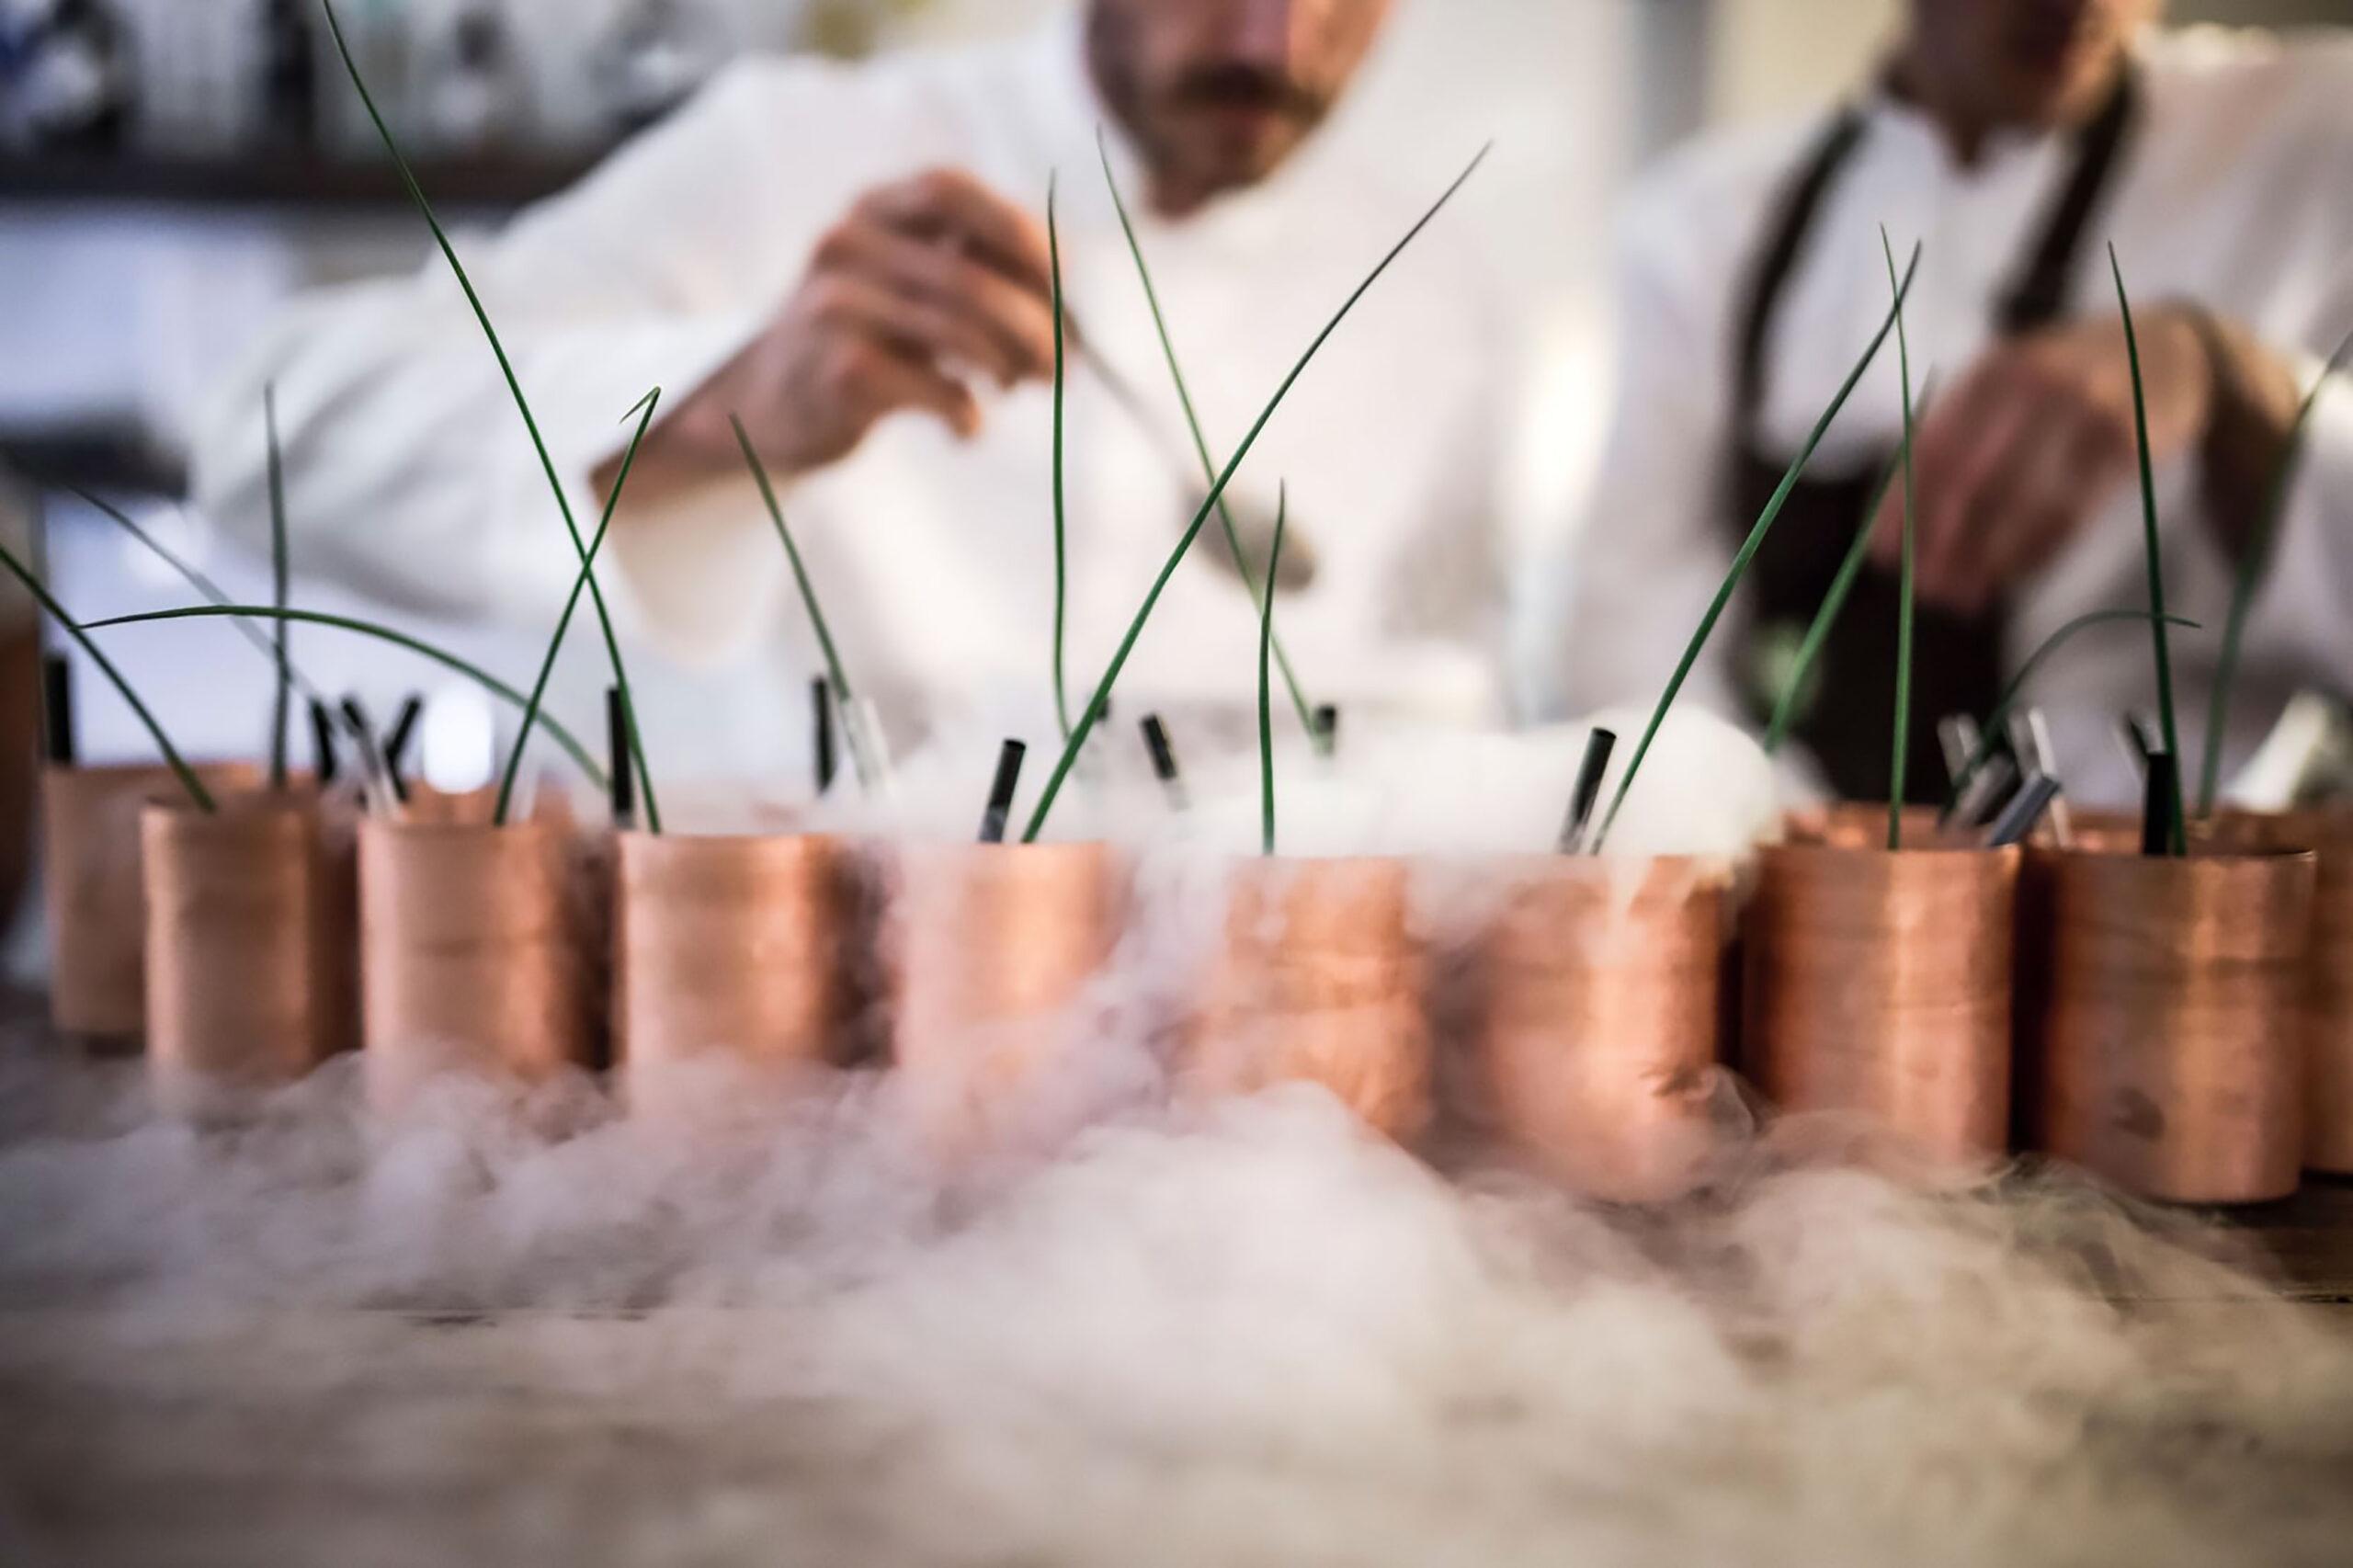 https://www.schoenhuberfranchi.it/wp-content/uploads/2020/12/GLASSWARE-Mule-copper-mug-design-Lara-Caffi-Chef-Saulo-Osteria-H2O-ph-Nicolo-Brunelli-scaled.jpg